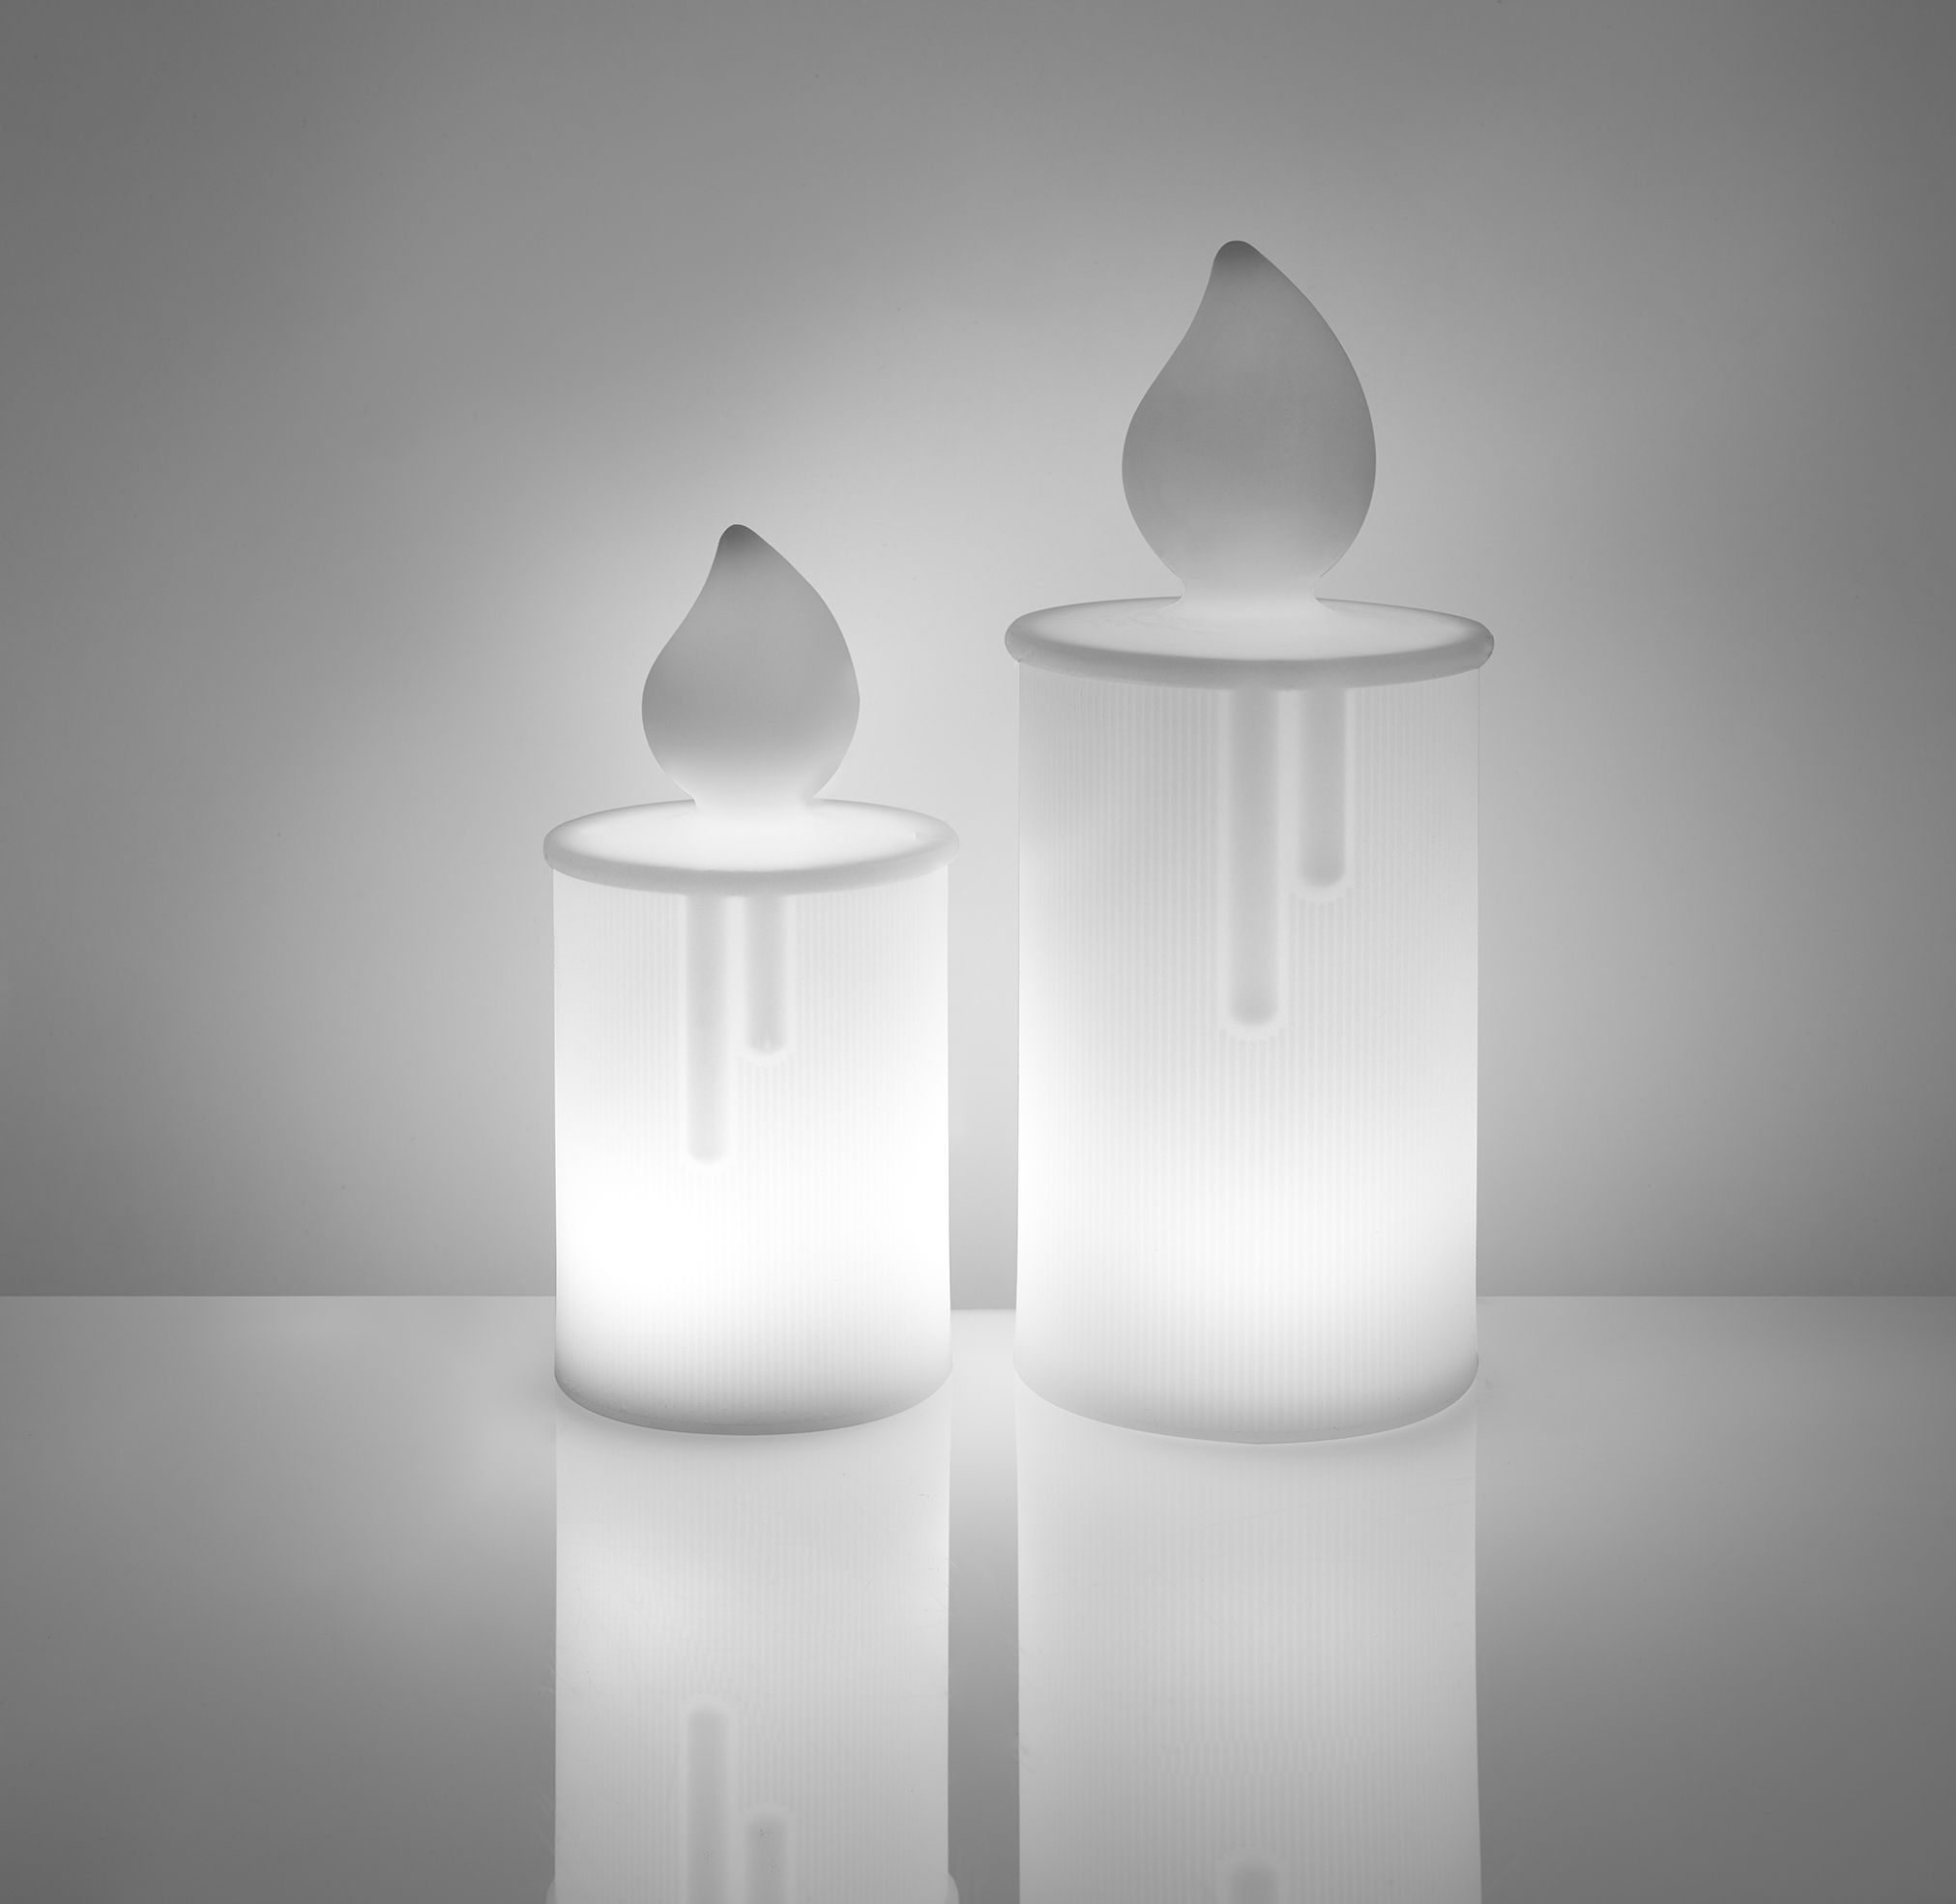 Wireless Lamp Fiamma By Slide White Made In Design Uk